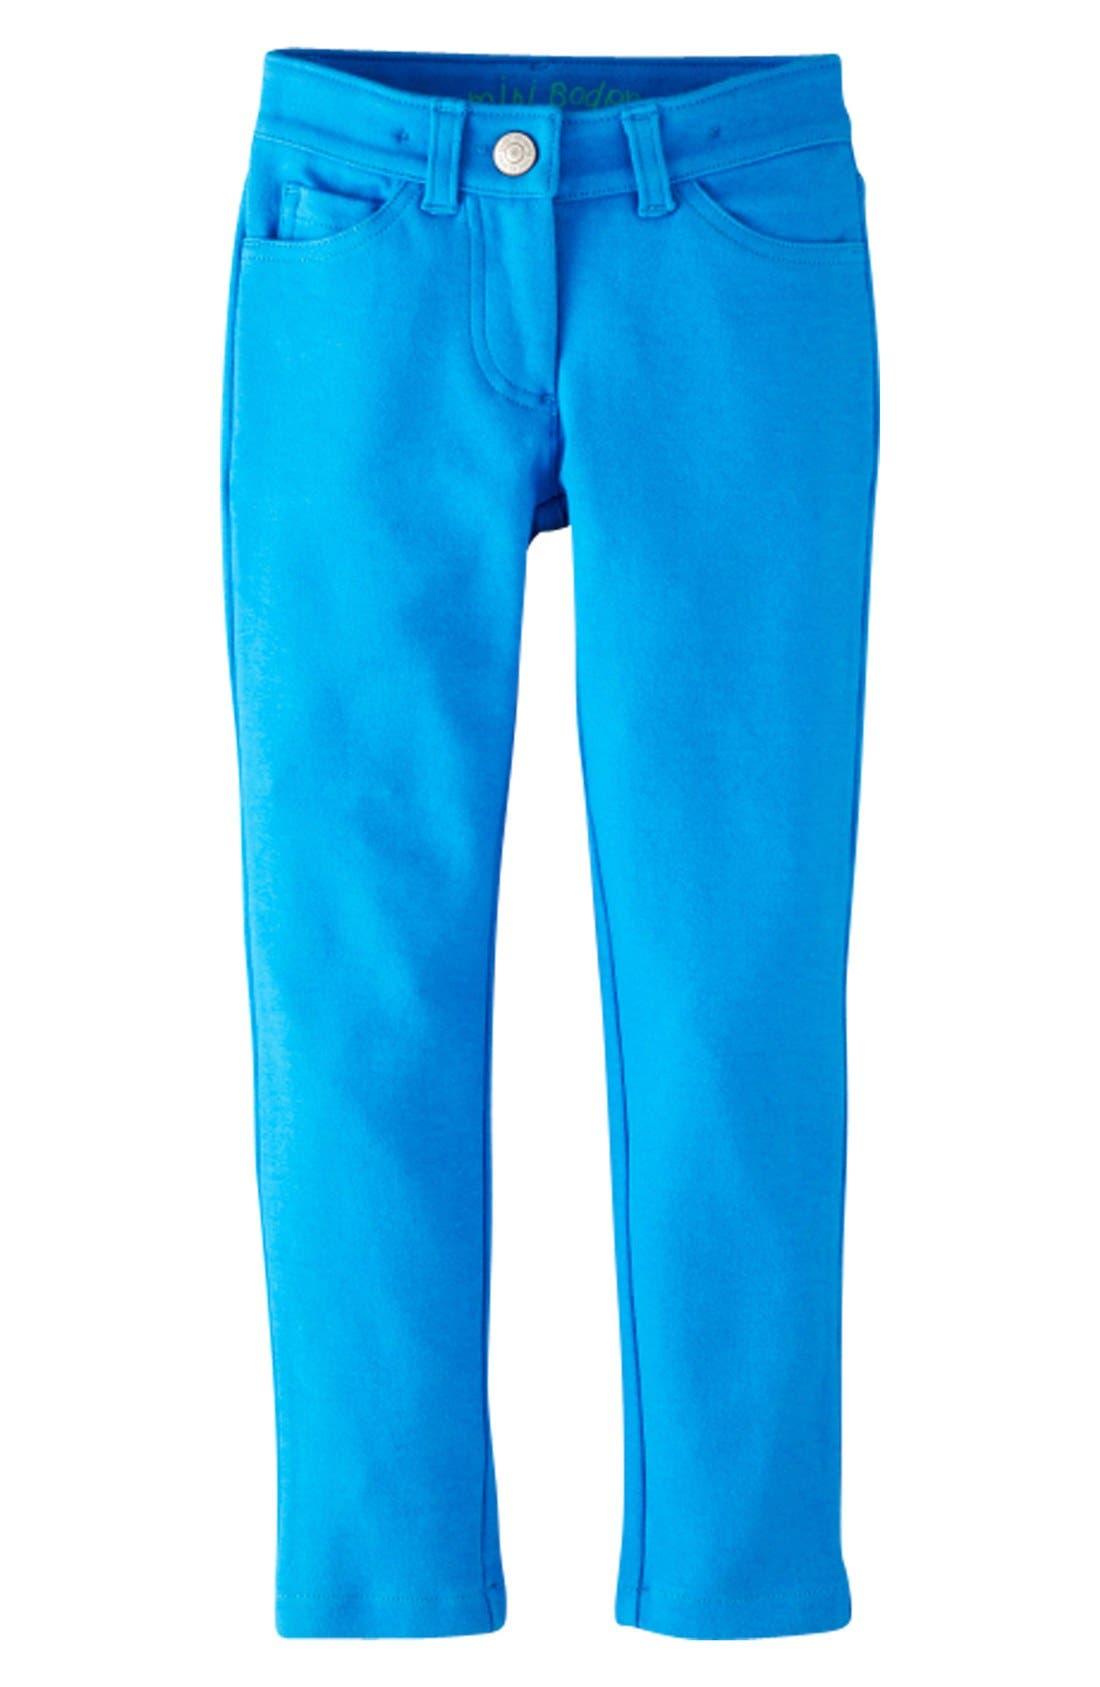 Main Image - Mini Boden Jersey Knit Jeans (Toddler Girls, Little Girls & Big Girls)